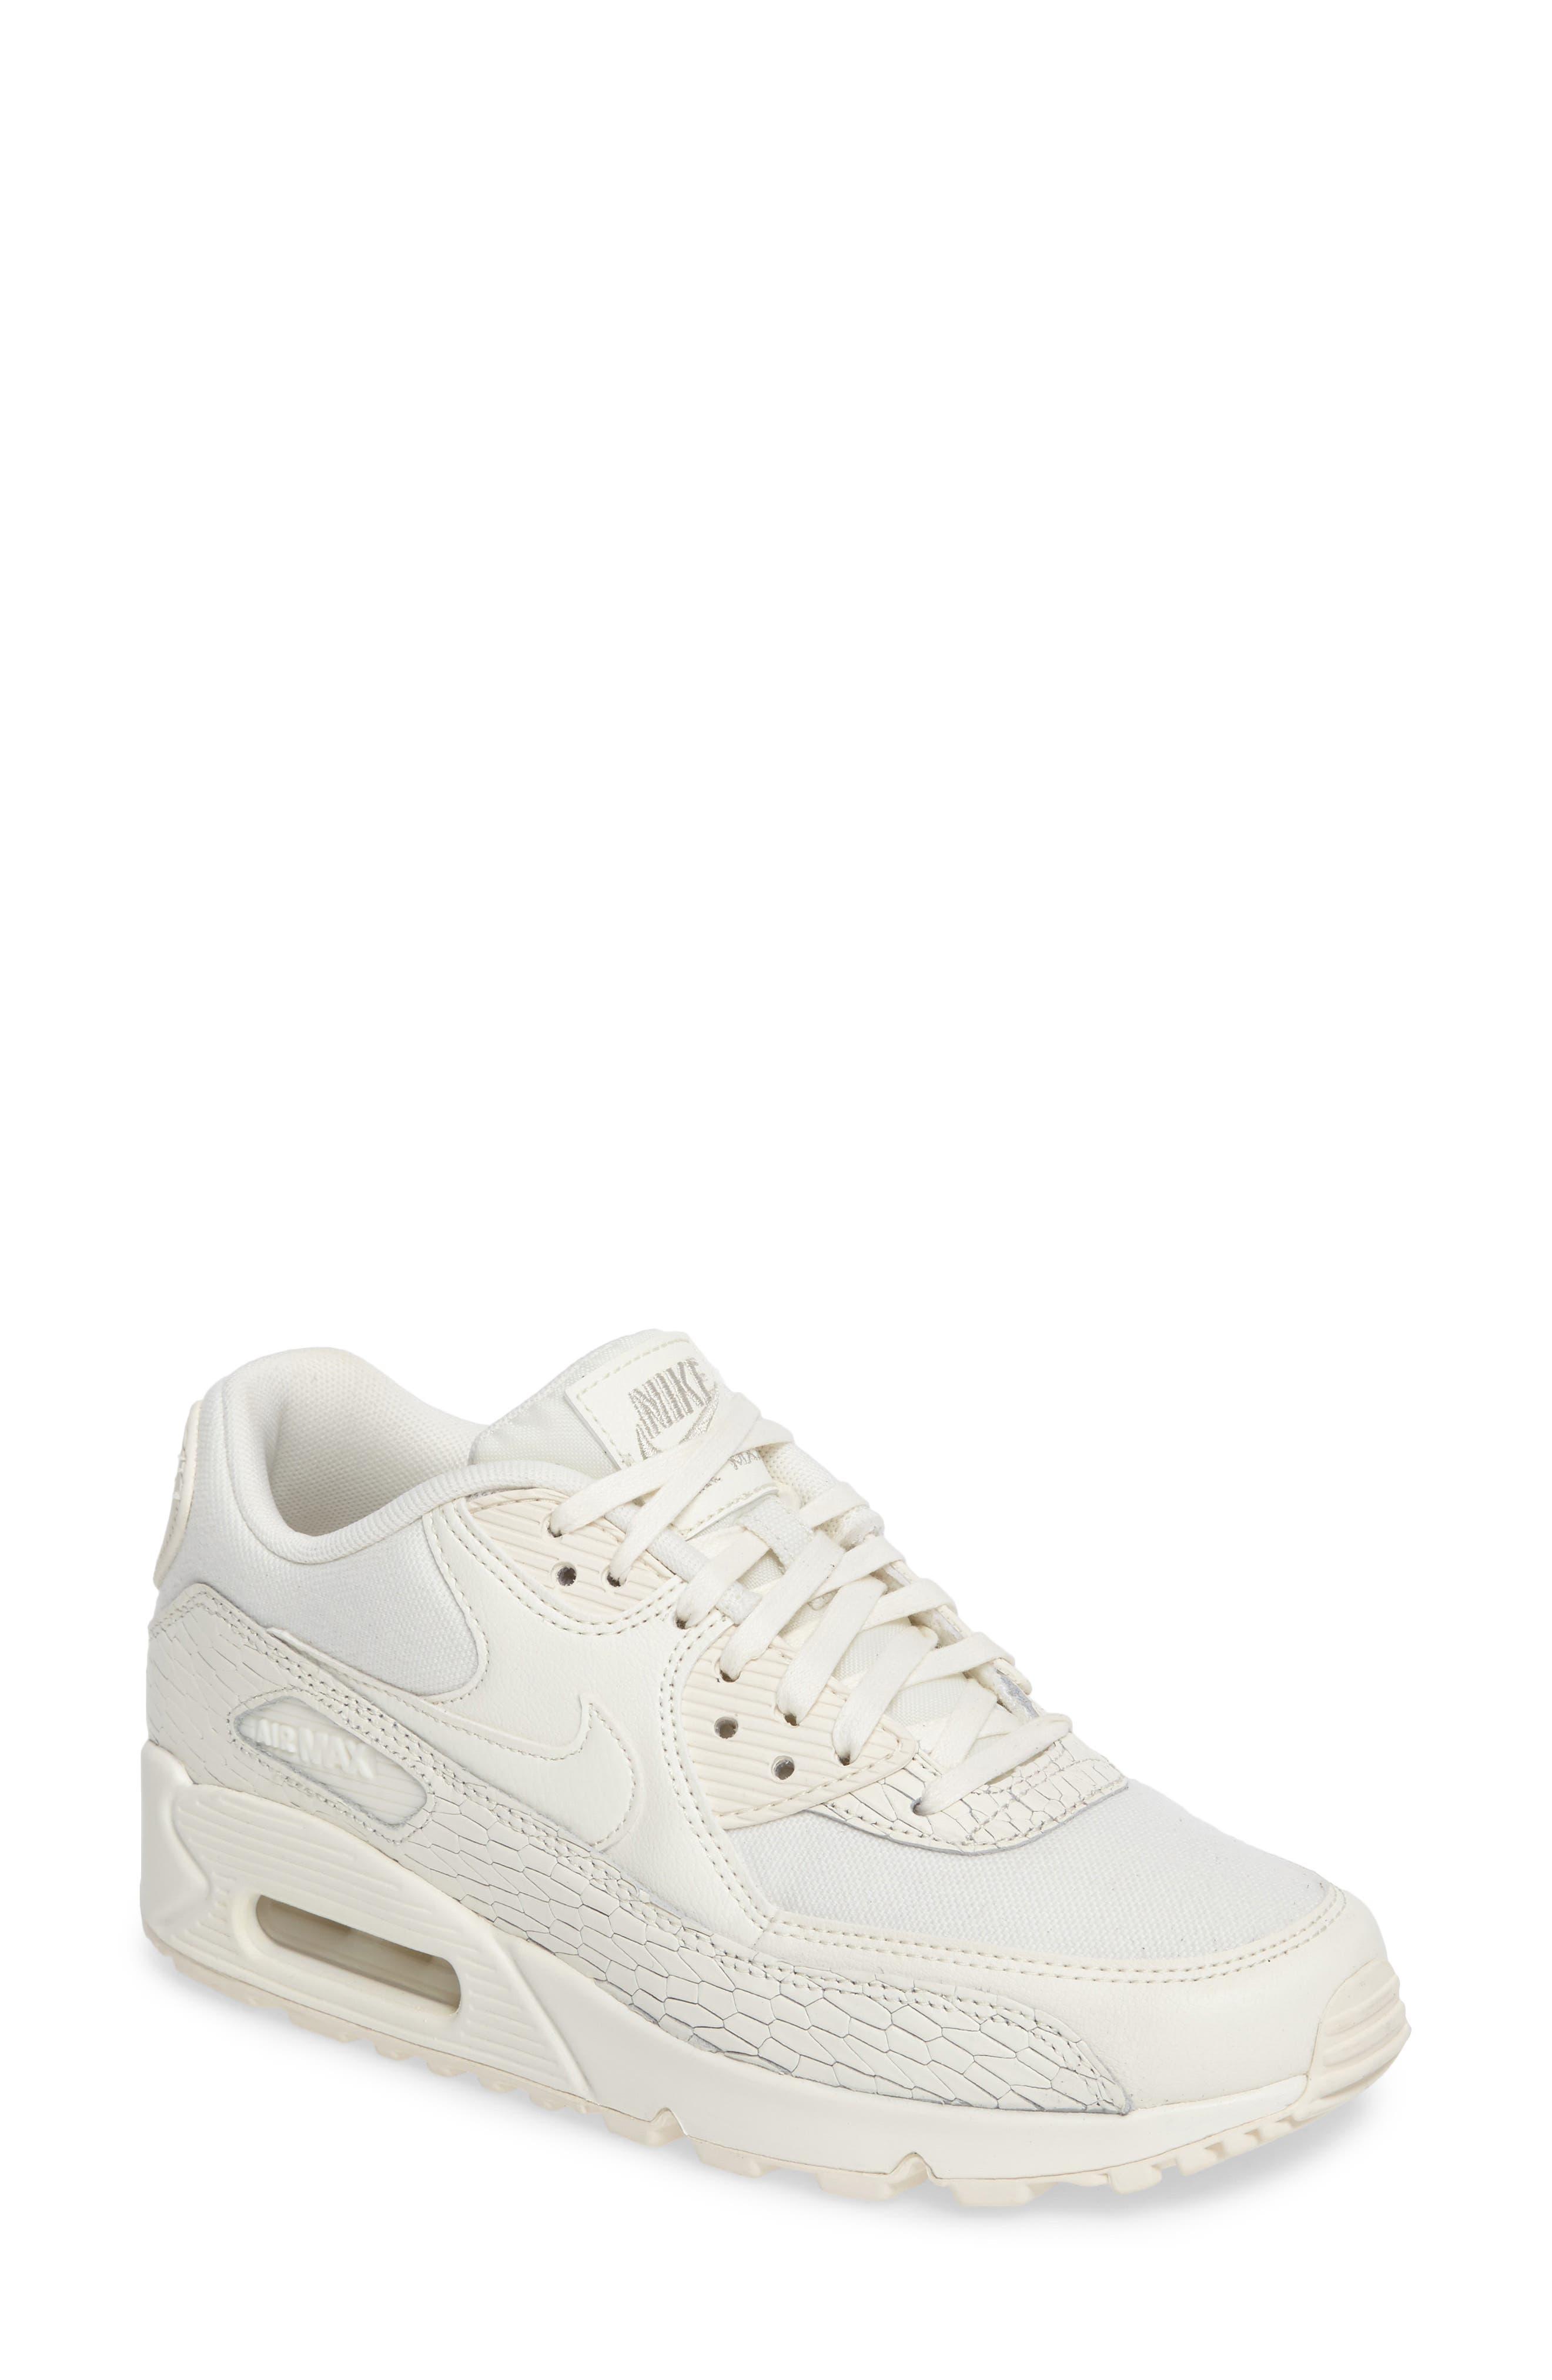 Air Max 90 Premium Leather Sneaker,                         Main,                         color, 250